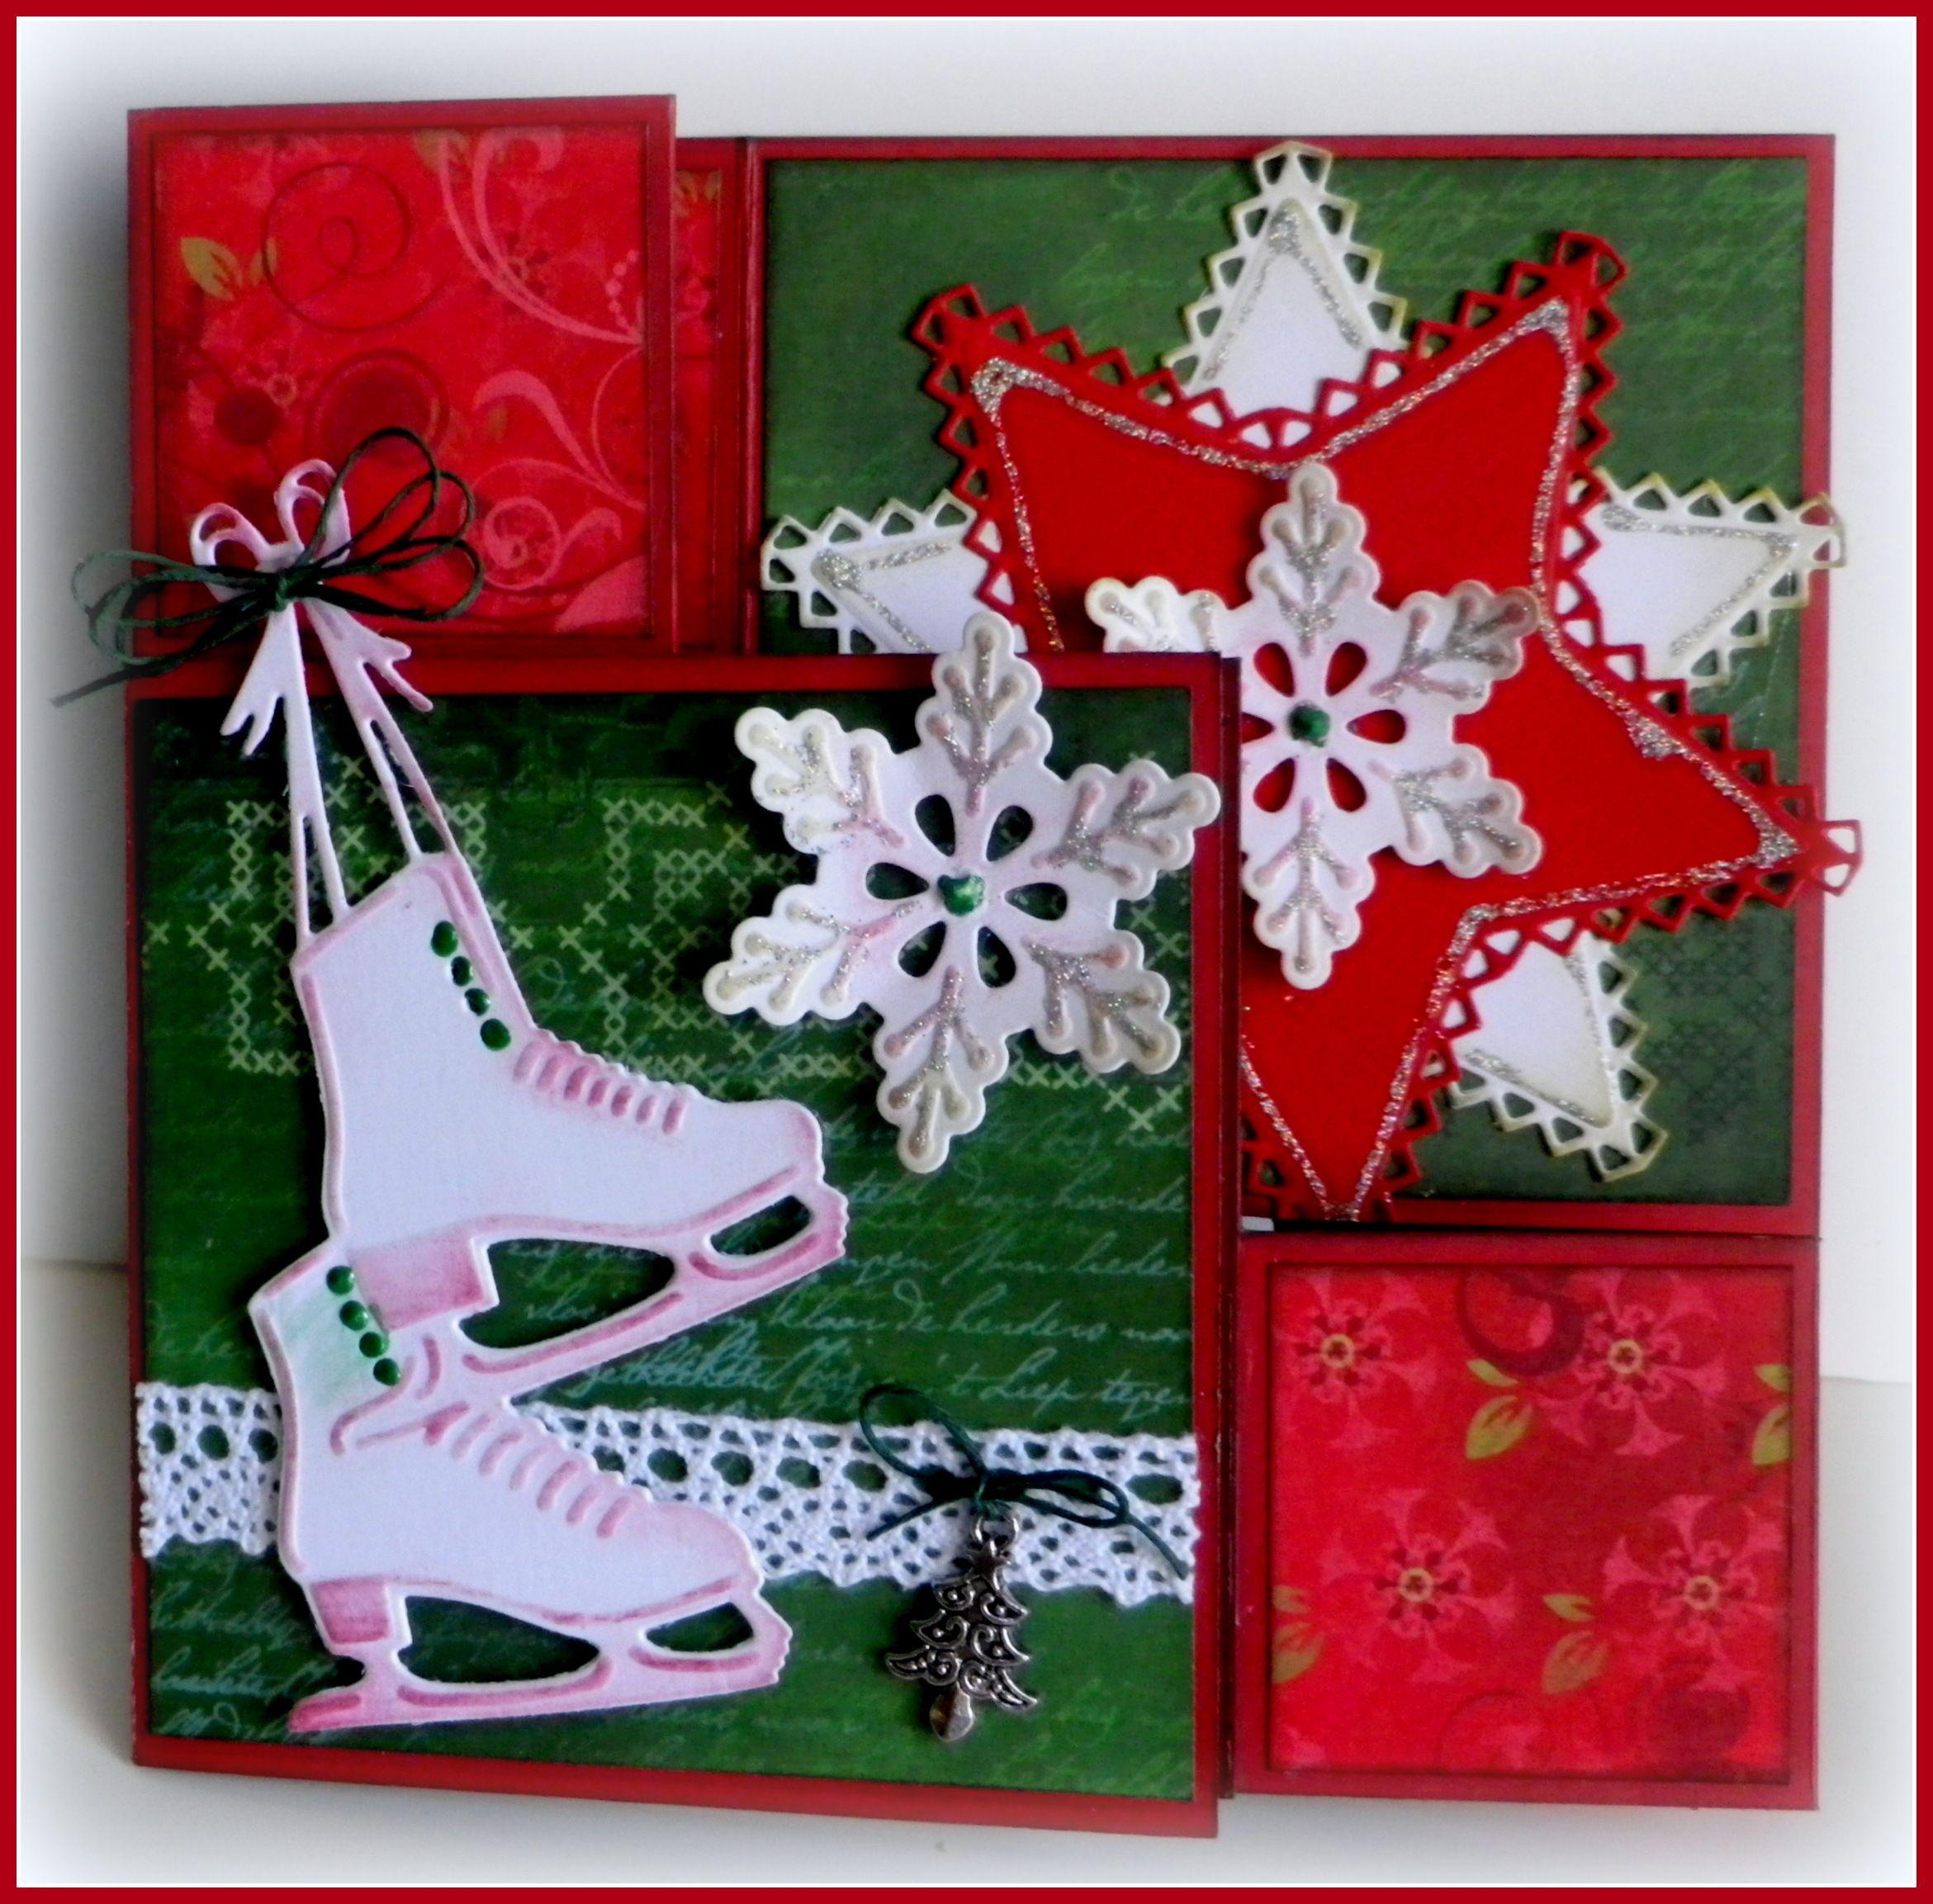 carte de no l marianne design my christmas cards pinterest marianne design marianne et. Black Bedroom Furniture Sets. Home Design Ideas